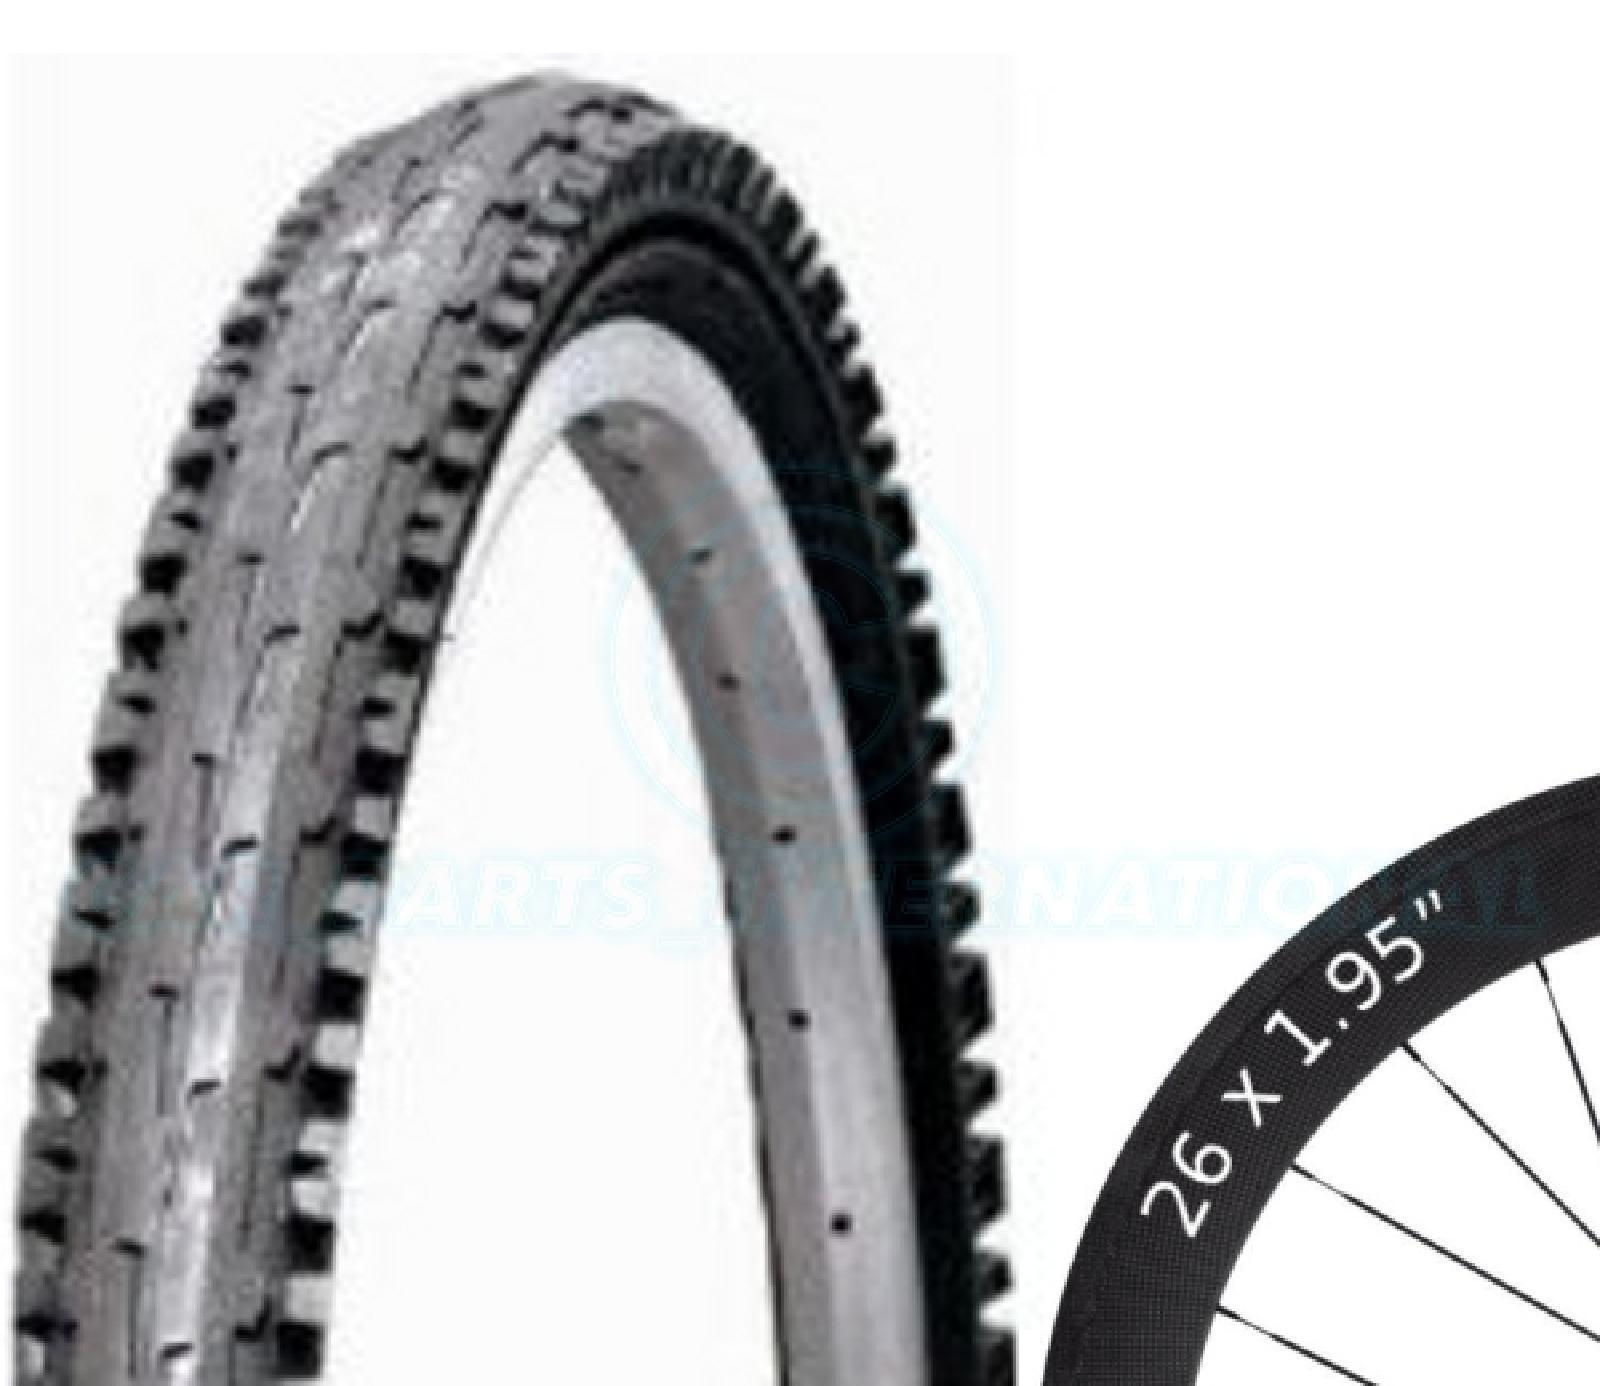 Vancom 26 inch x 1.95 inch 2 Bicycle